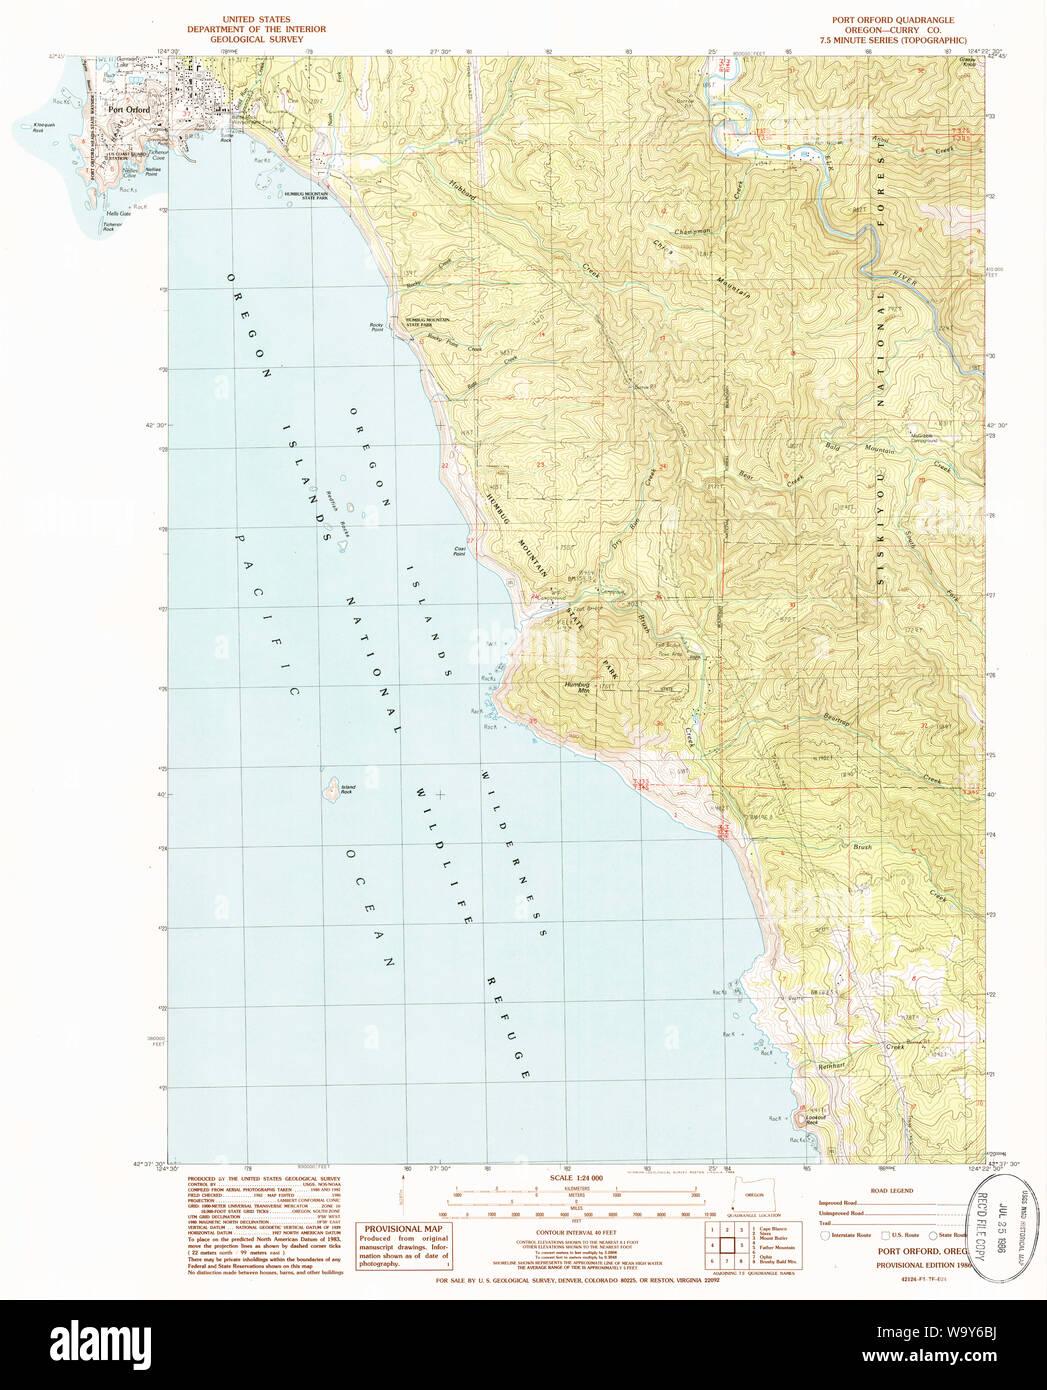 port orford oregon map Map Of Port Stock Photos Map Of Port Stock Images Page 15 Alamy port orford oregon map